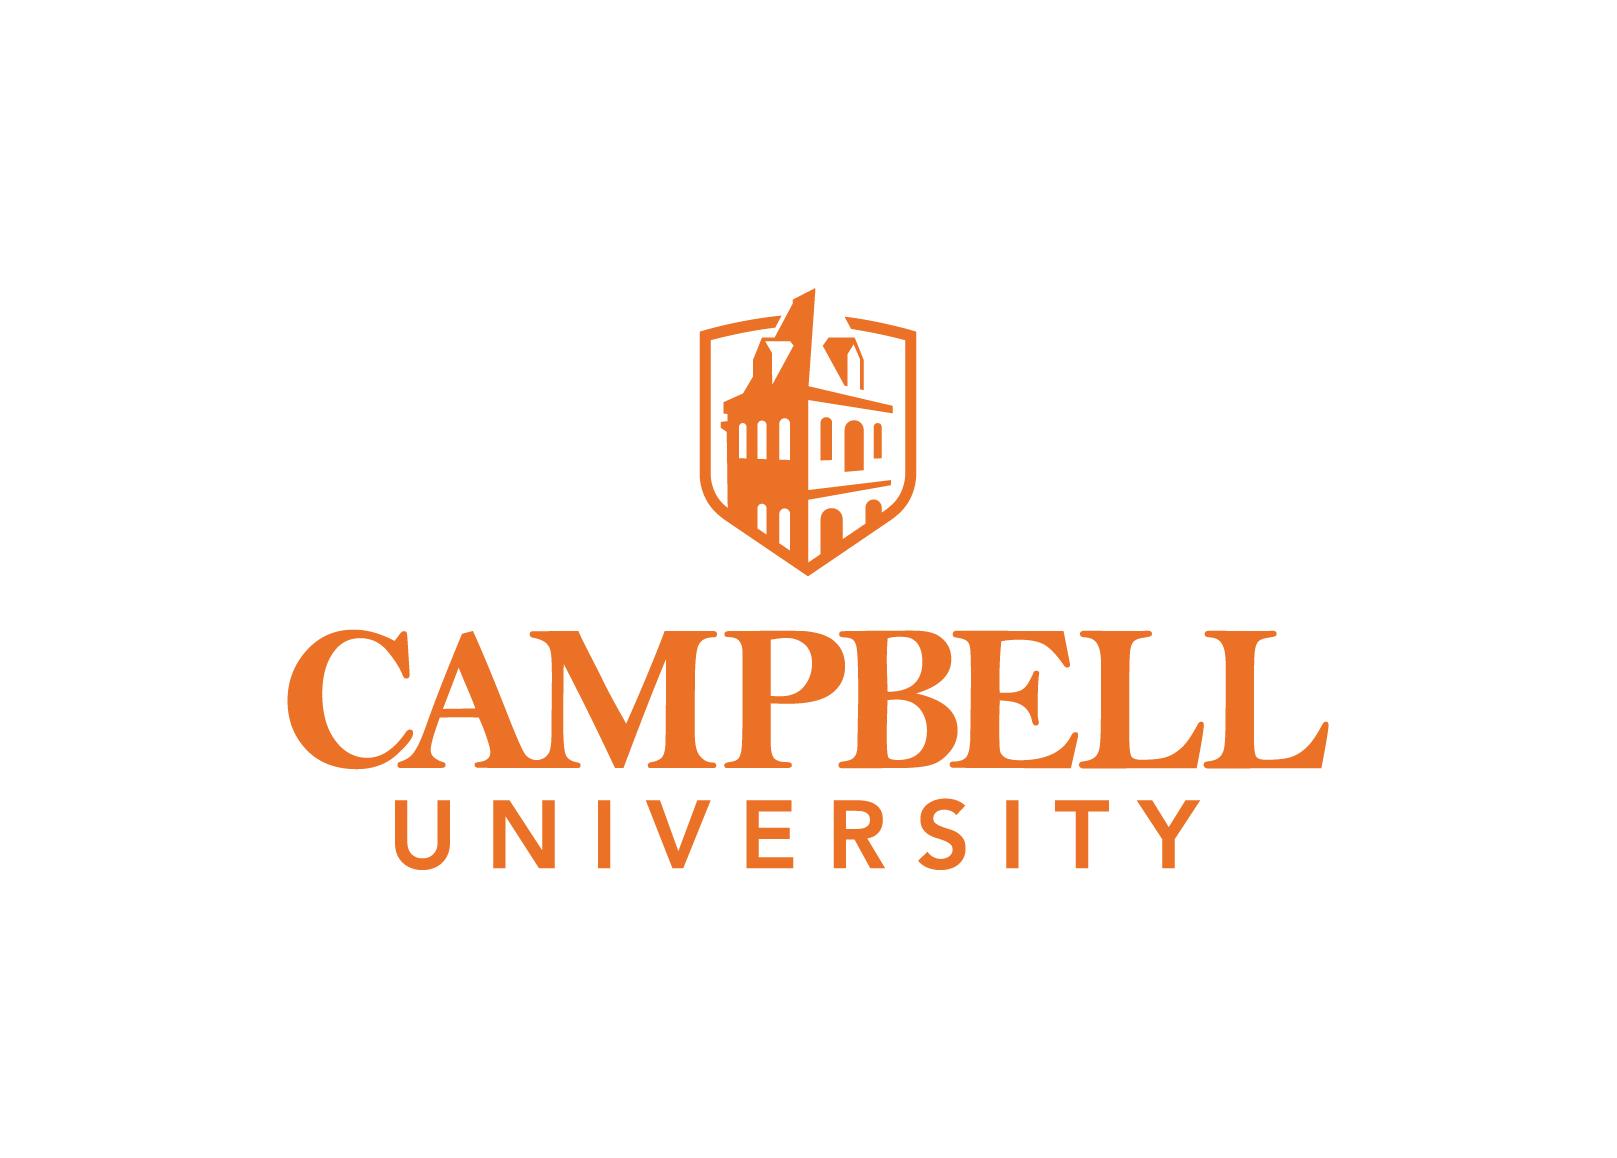 Campbell university logo center align   screen   2017